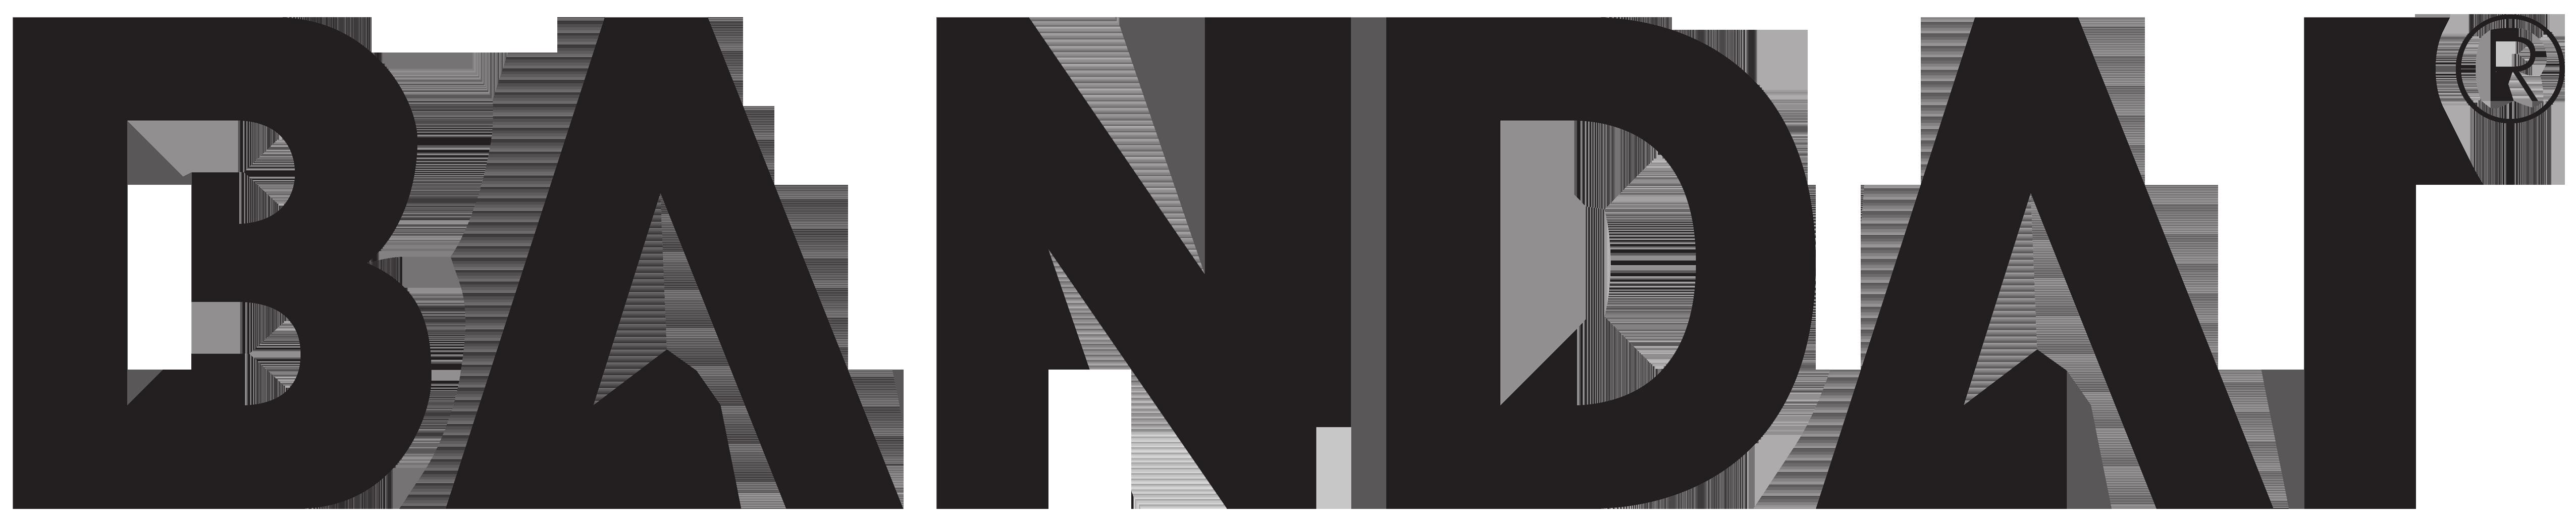 File:Bandai early logo.png.